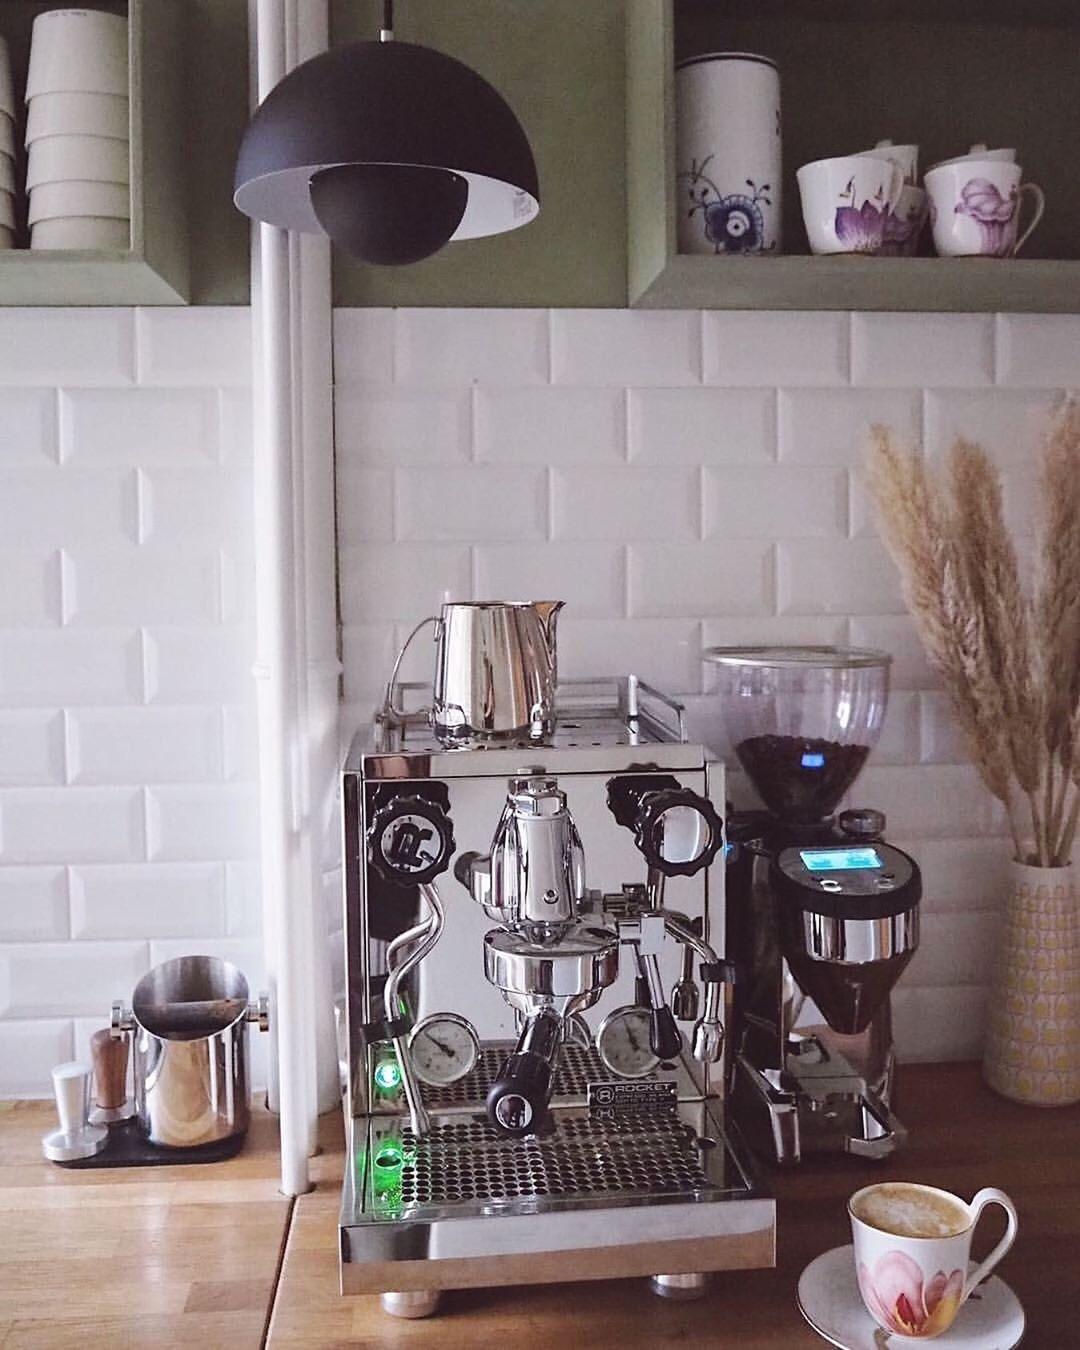 Rocket Espresso at home with @inbloom.dk #rocketgiotto #macinatorefausto #rocket...-#kitchendesign #macinatorefausto #rocketathome #rocketgiotto #espressoathome